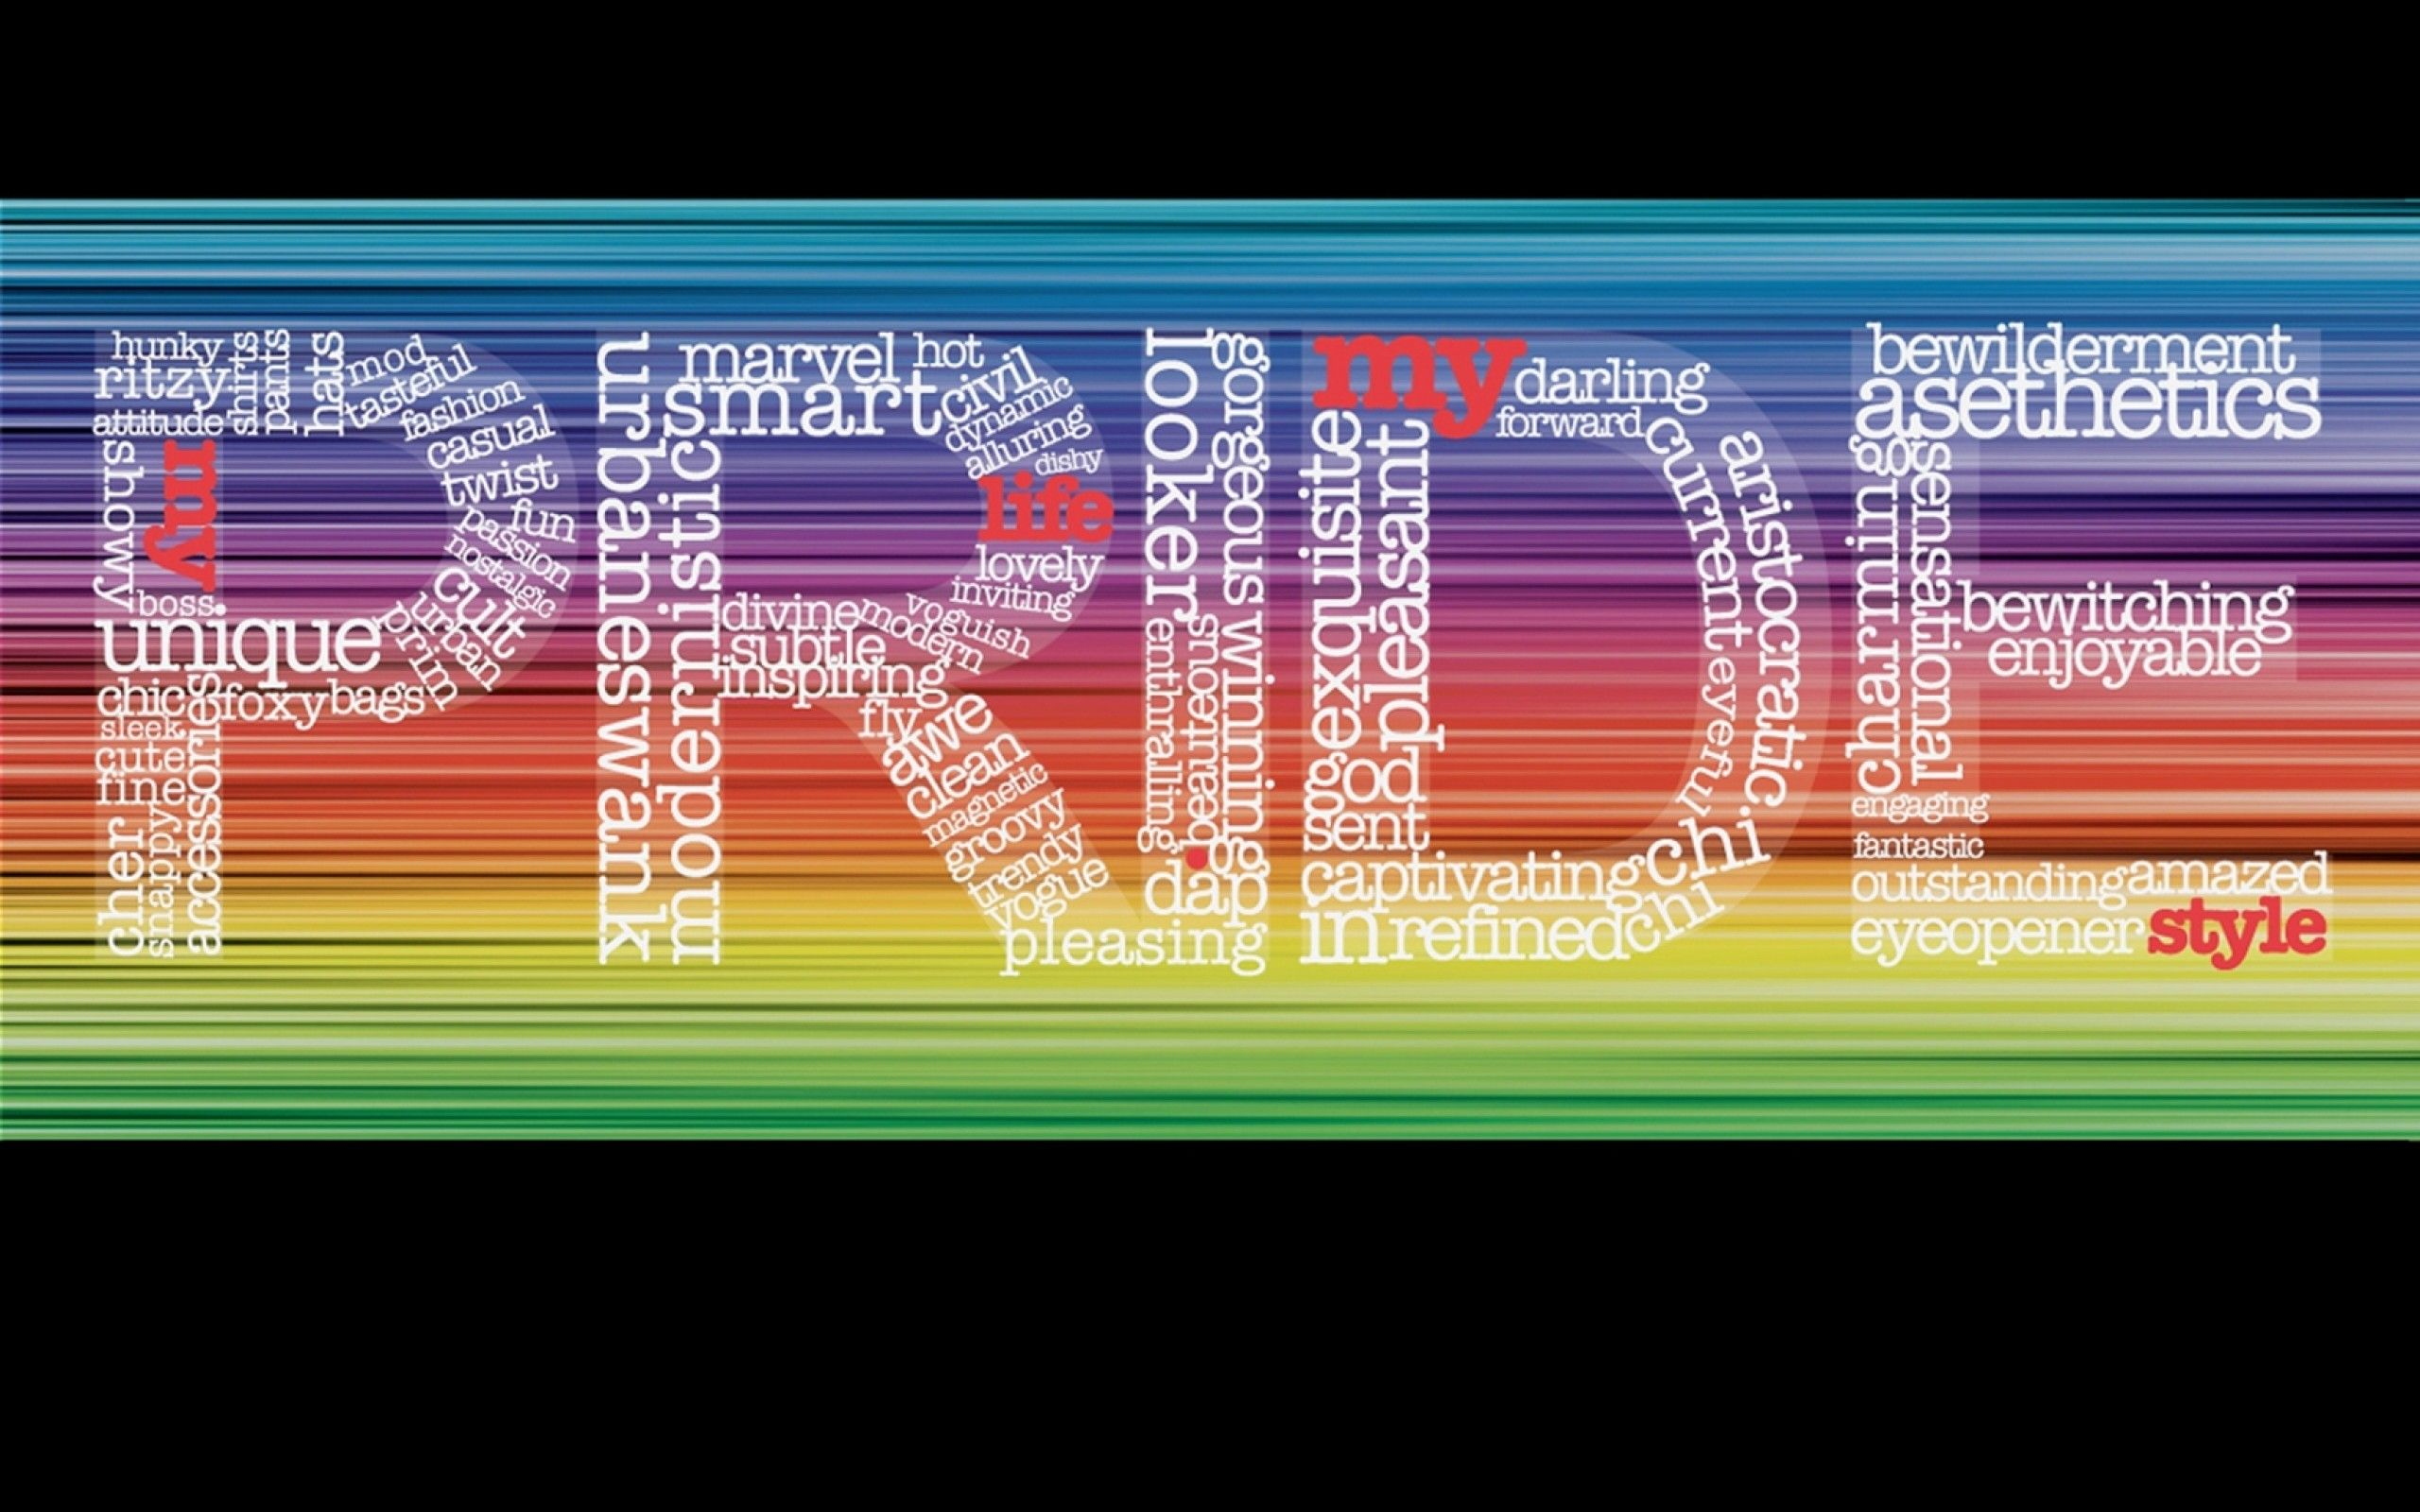 Lesbian pride computer wallpaper